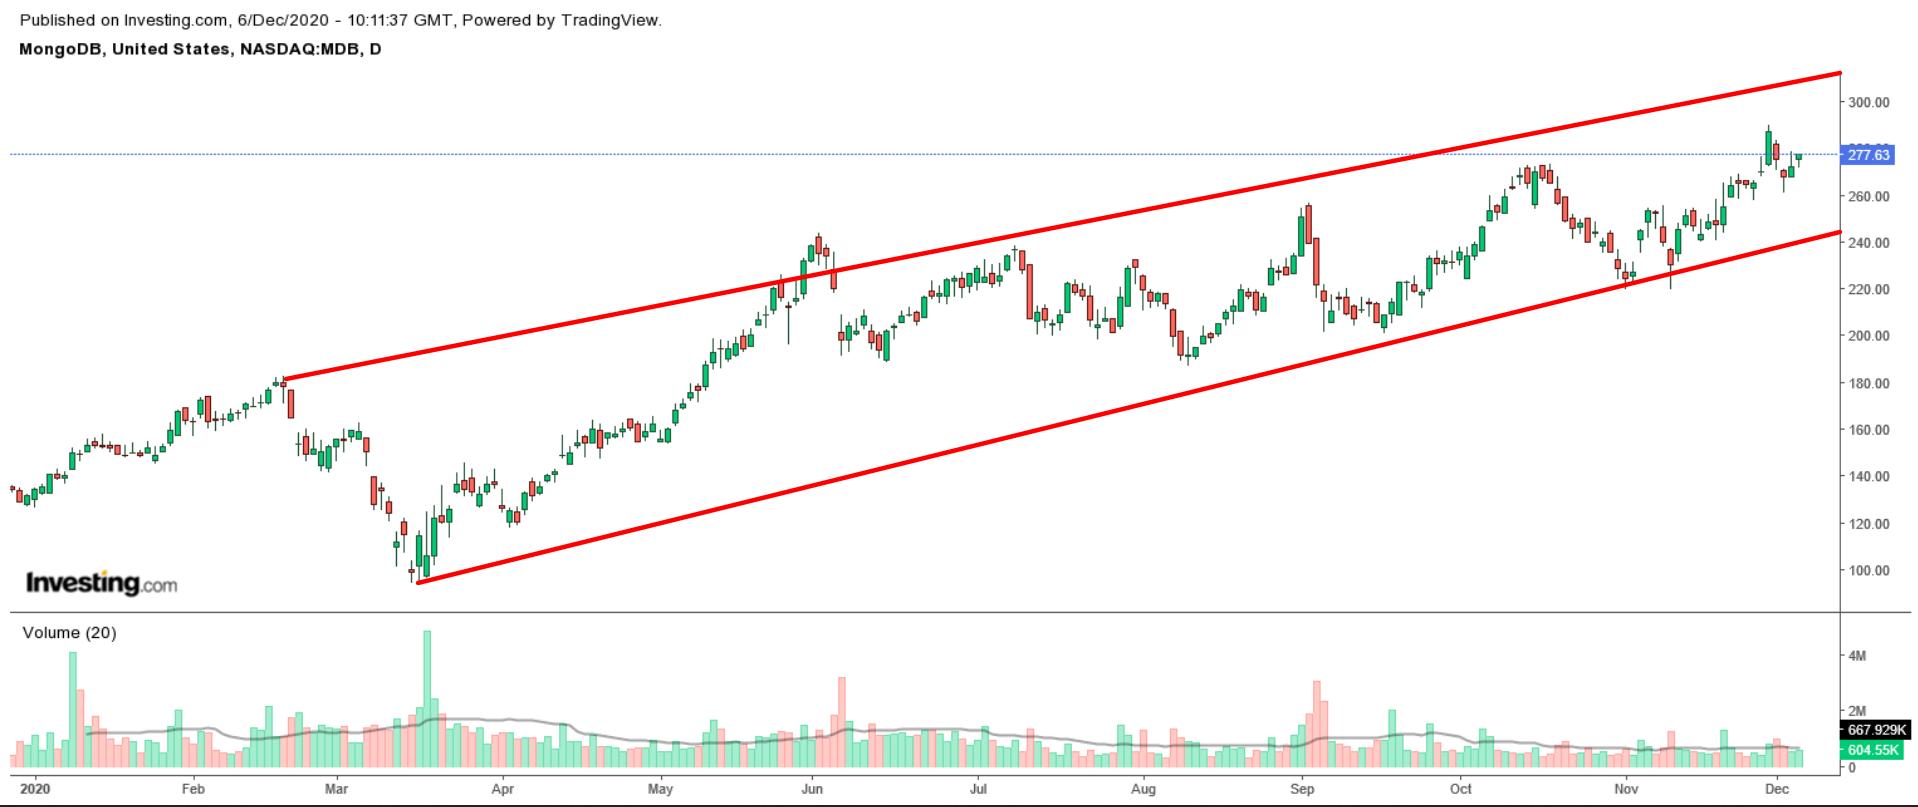 MongoDB Daily Chart